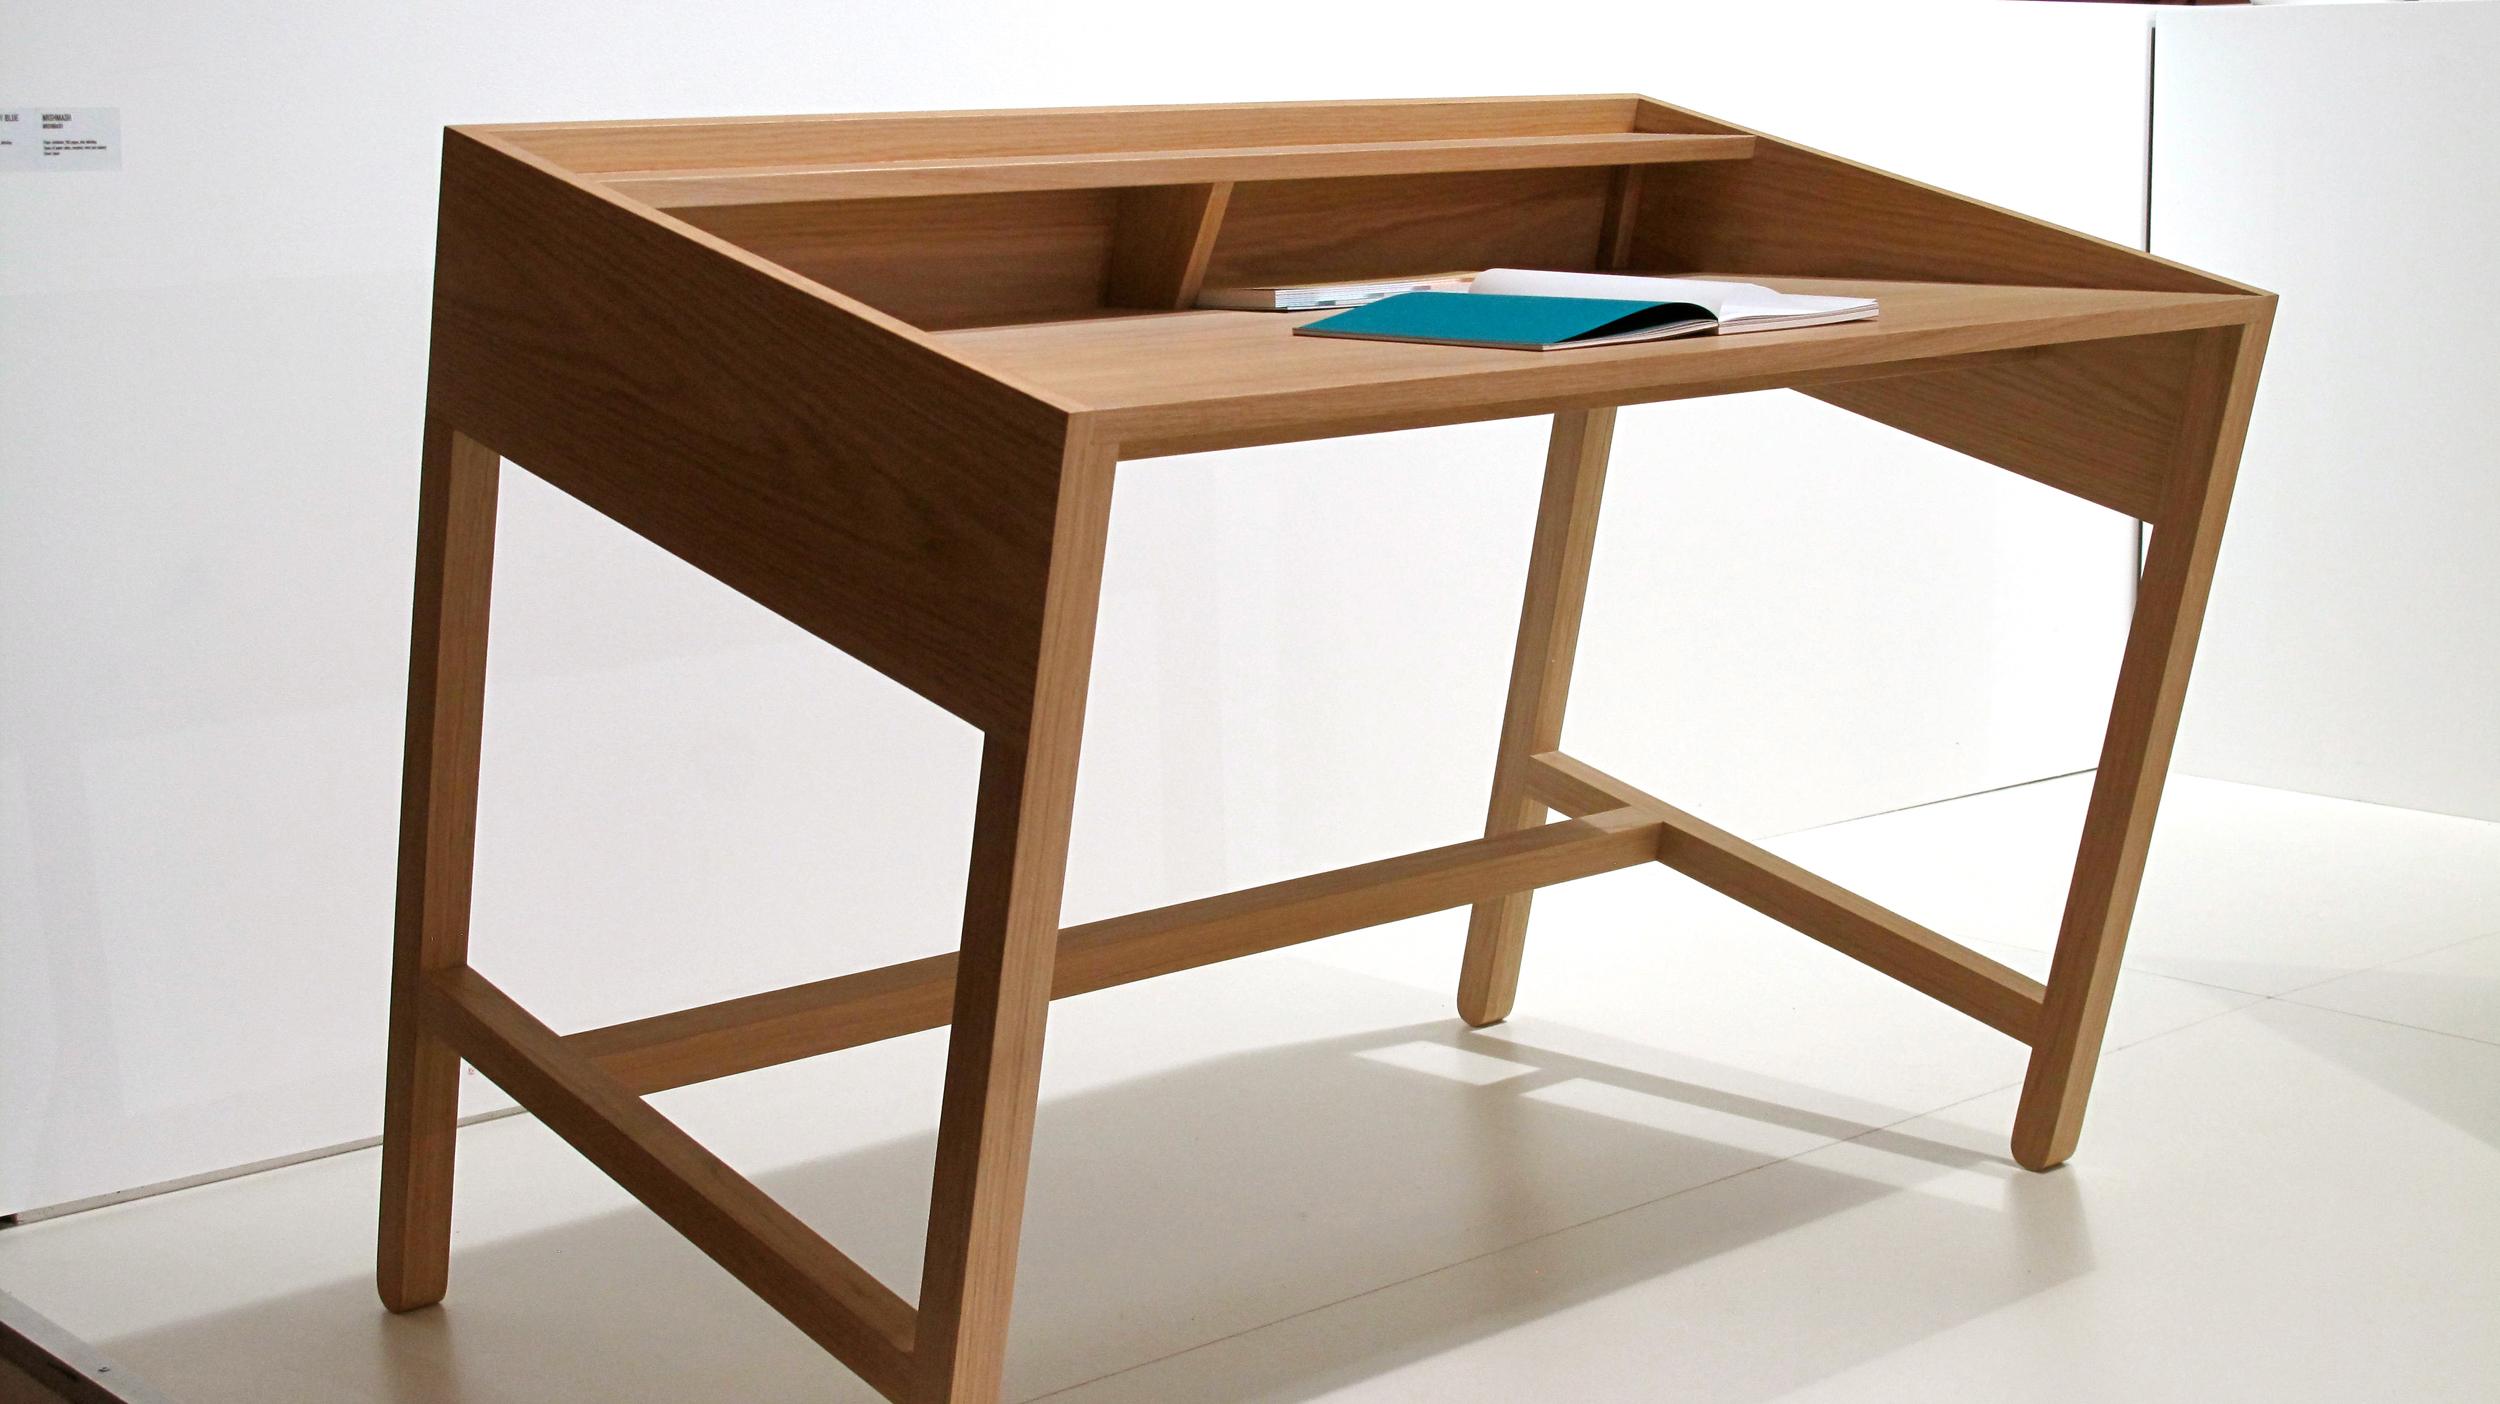 Torta  -Solid oak wood and oak plywood desk designed by Miguel Soeiro  Porventura | www.porventura.pt